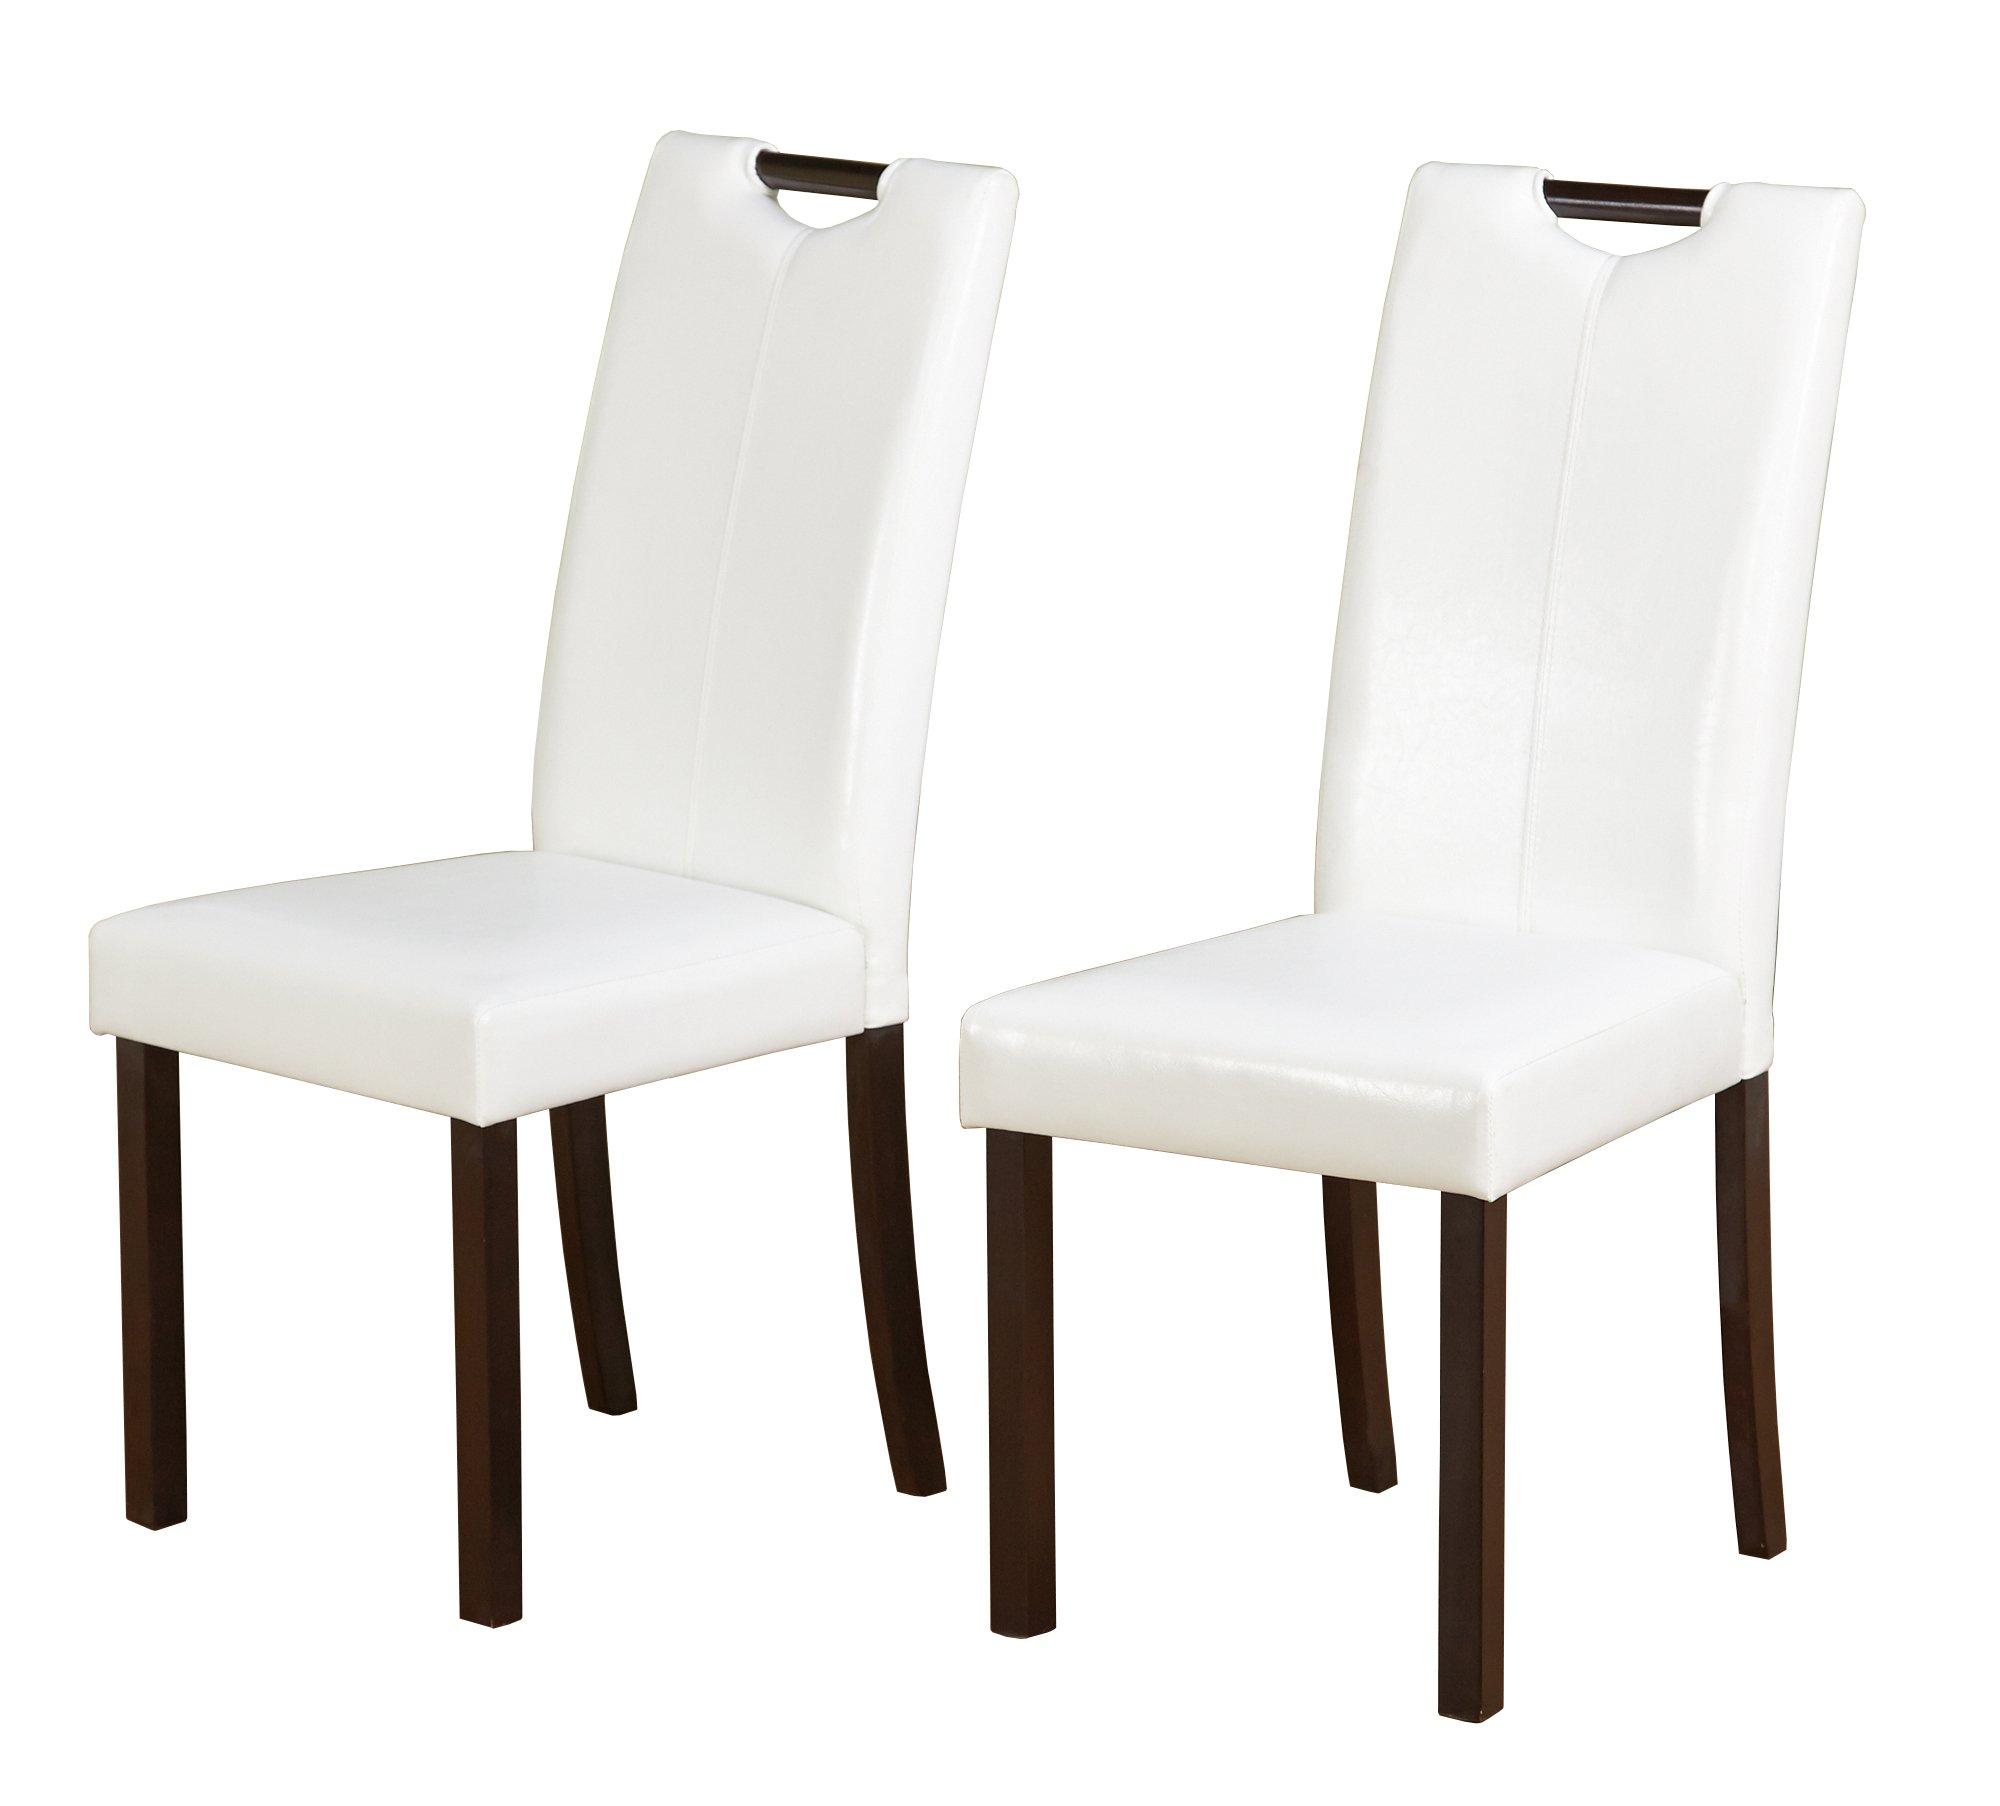 Target Marketing Systems 18018WHT PR Tilo Dining Chairs White by Target Marketing Systems